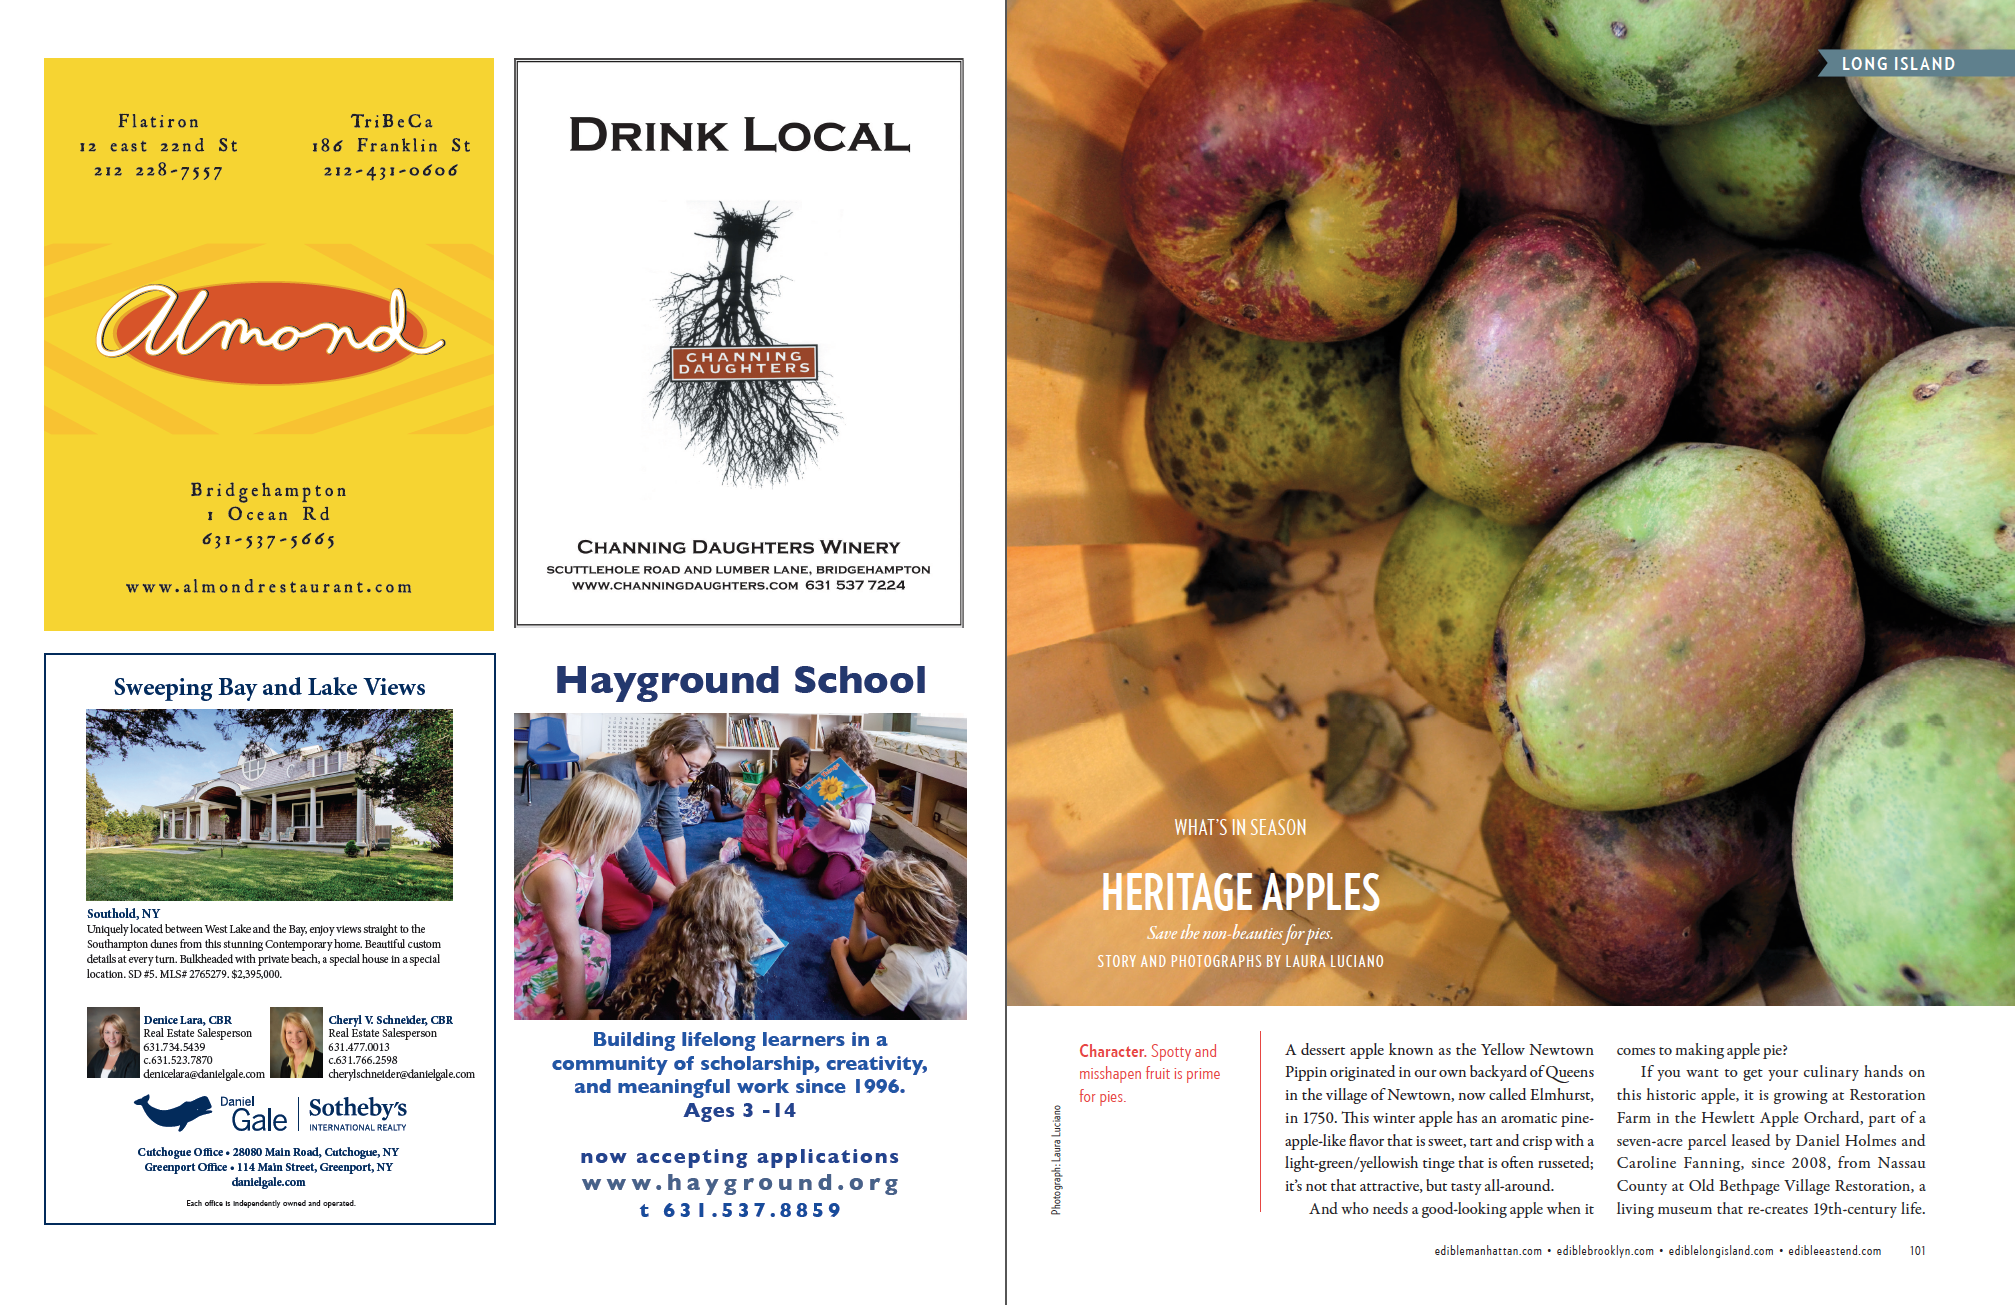 Heritage Apples (p.1 of 2)